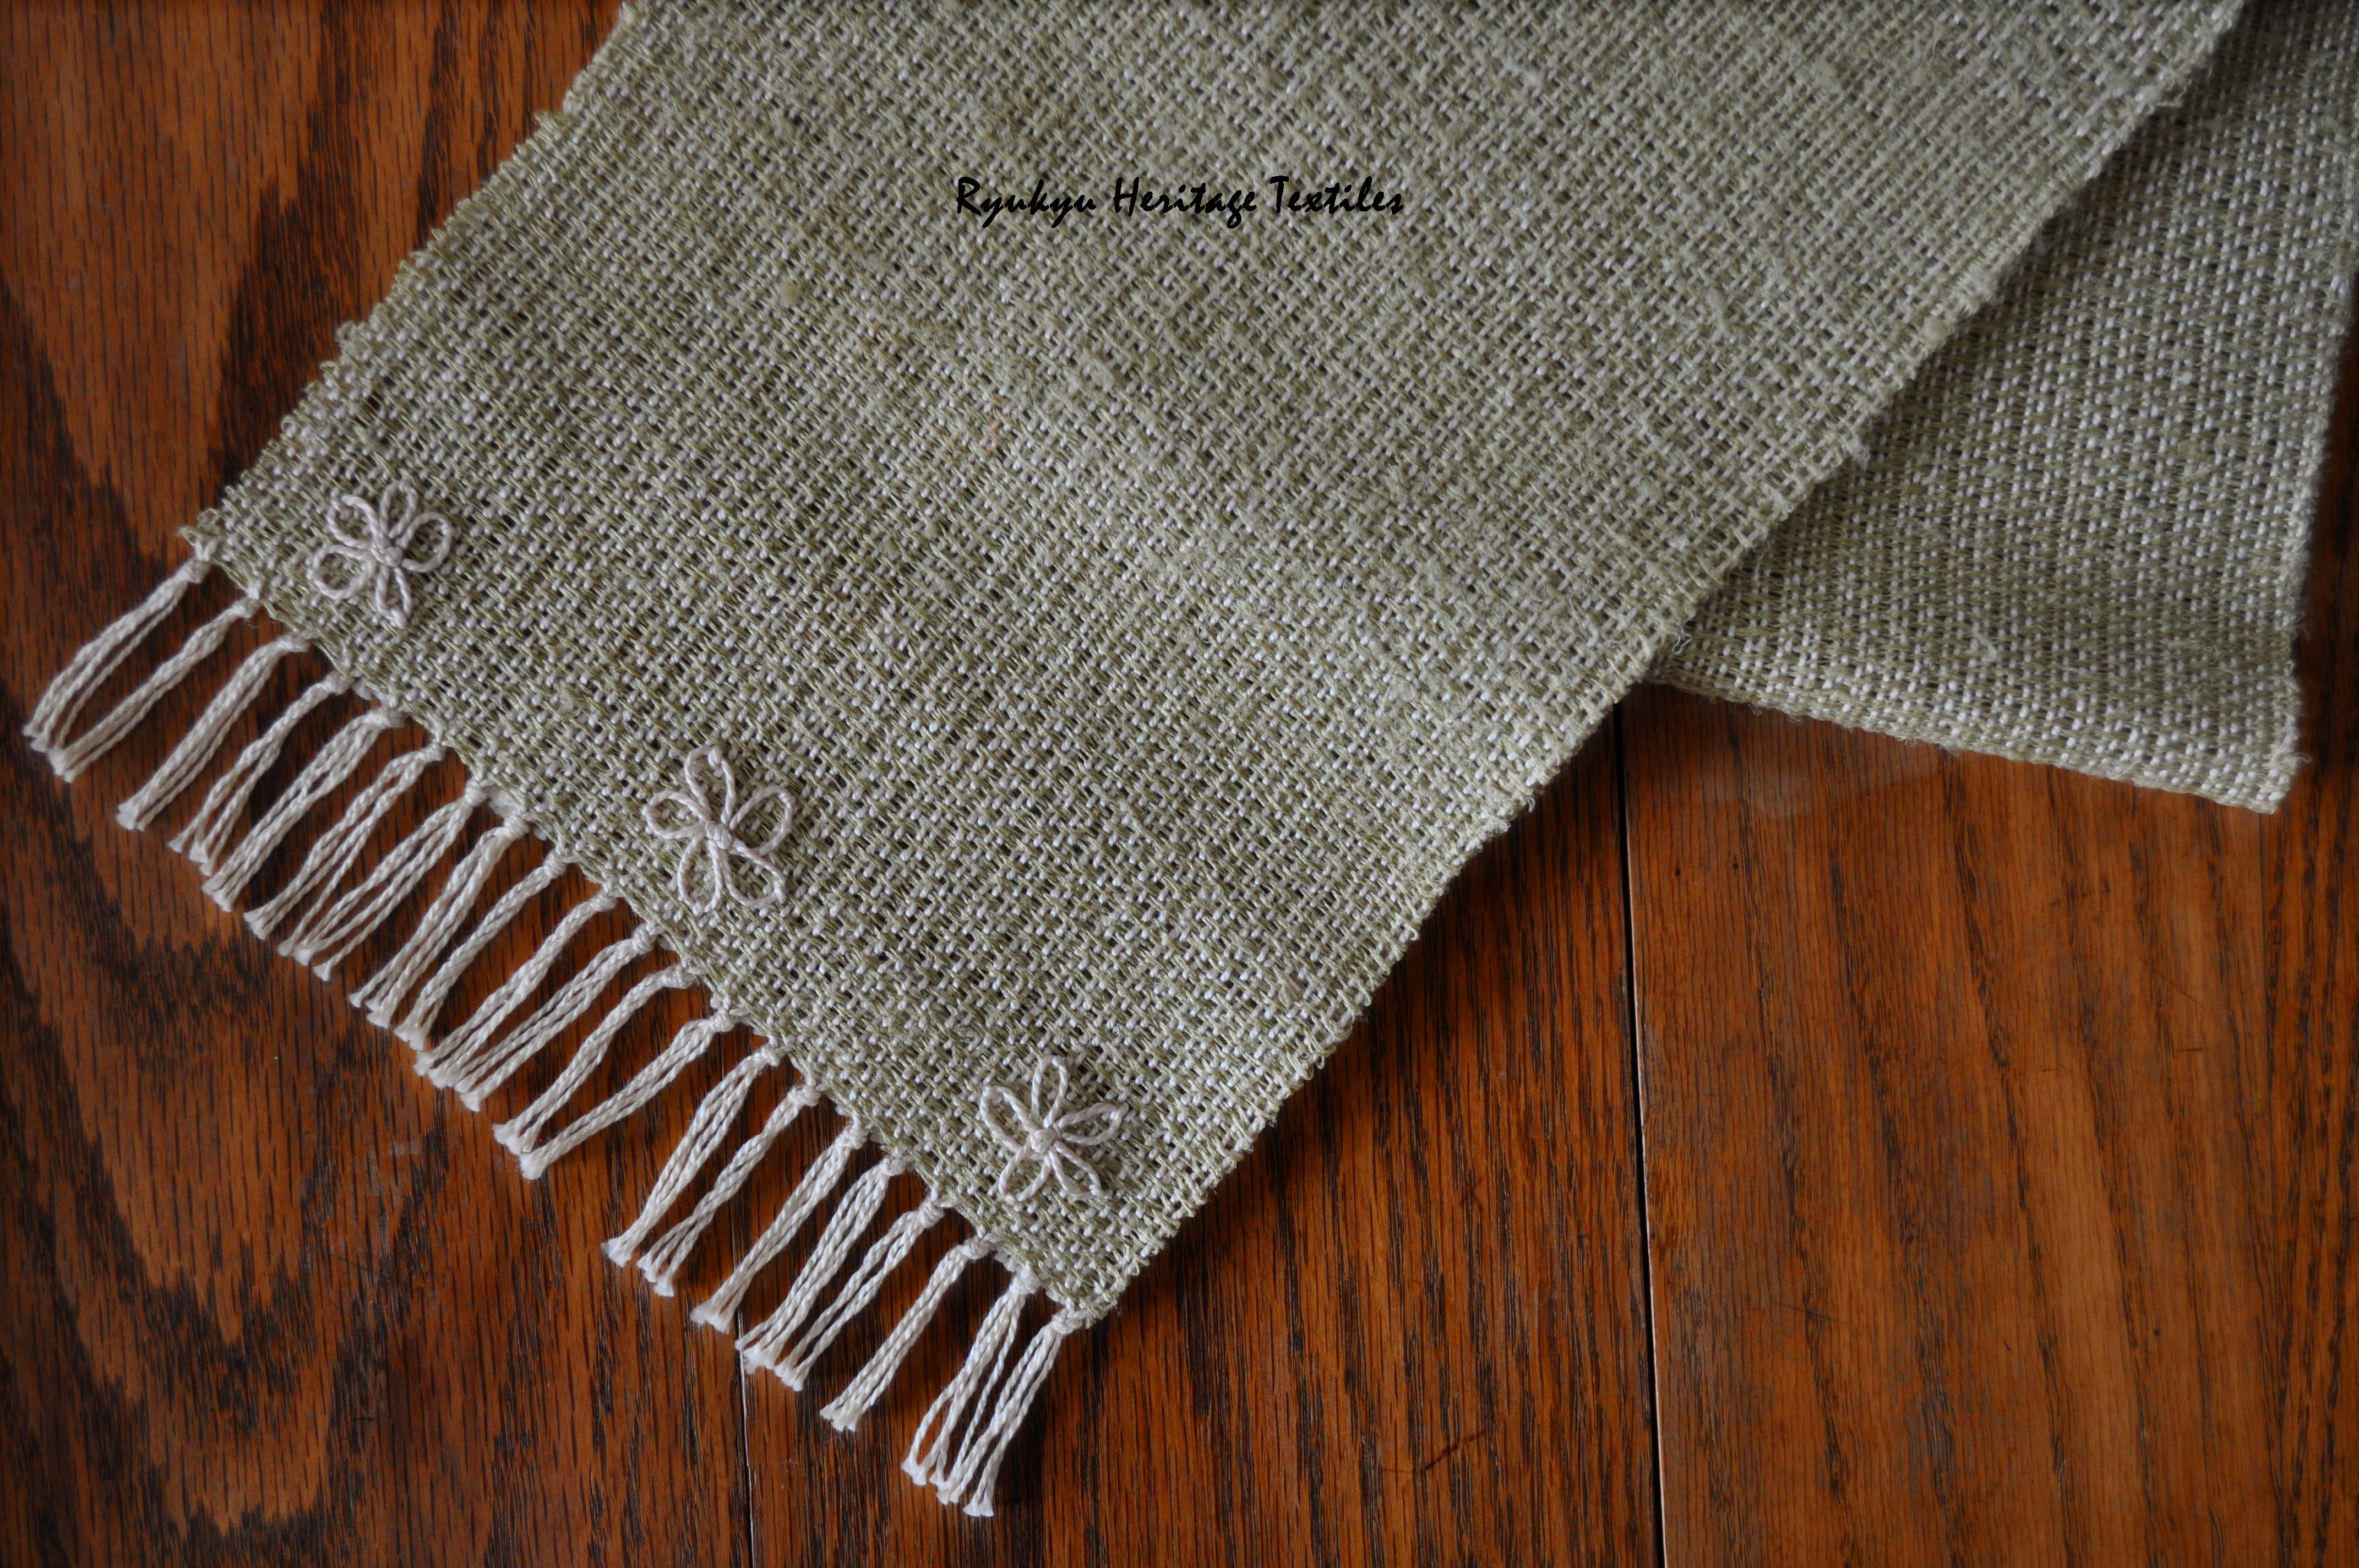 Bashofu | Ryukyu Heritage Textiles